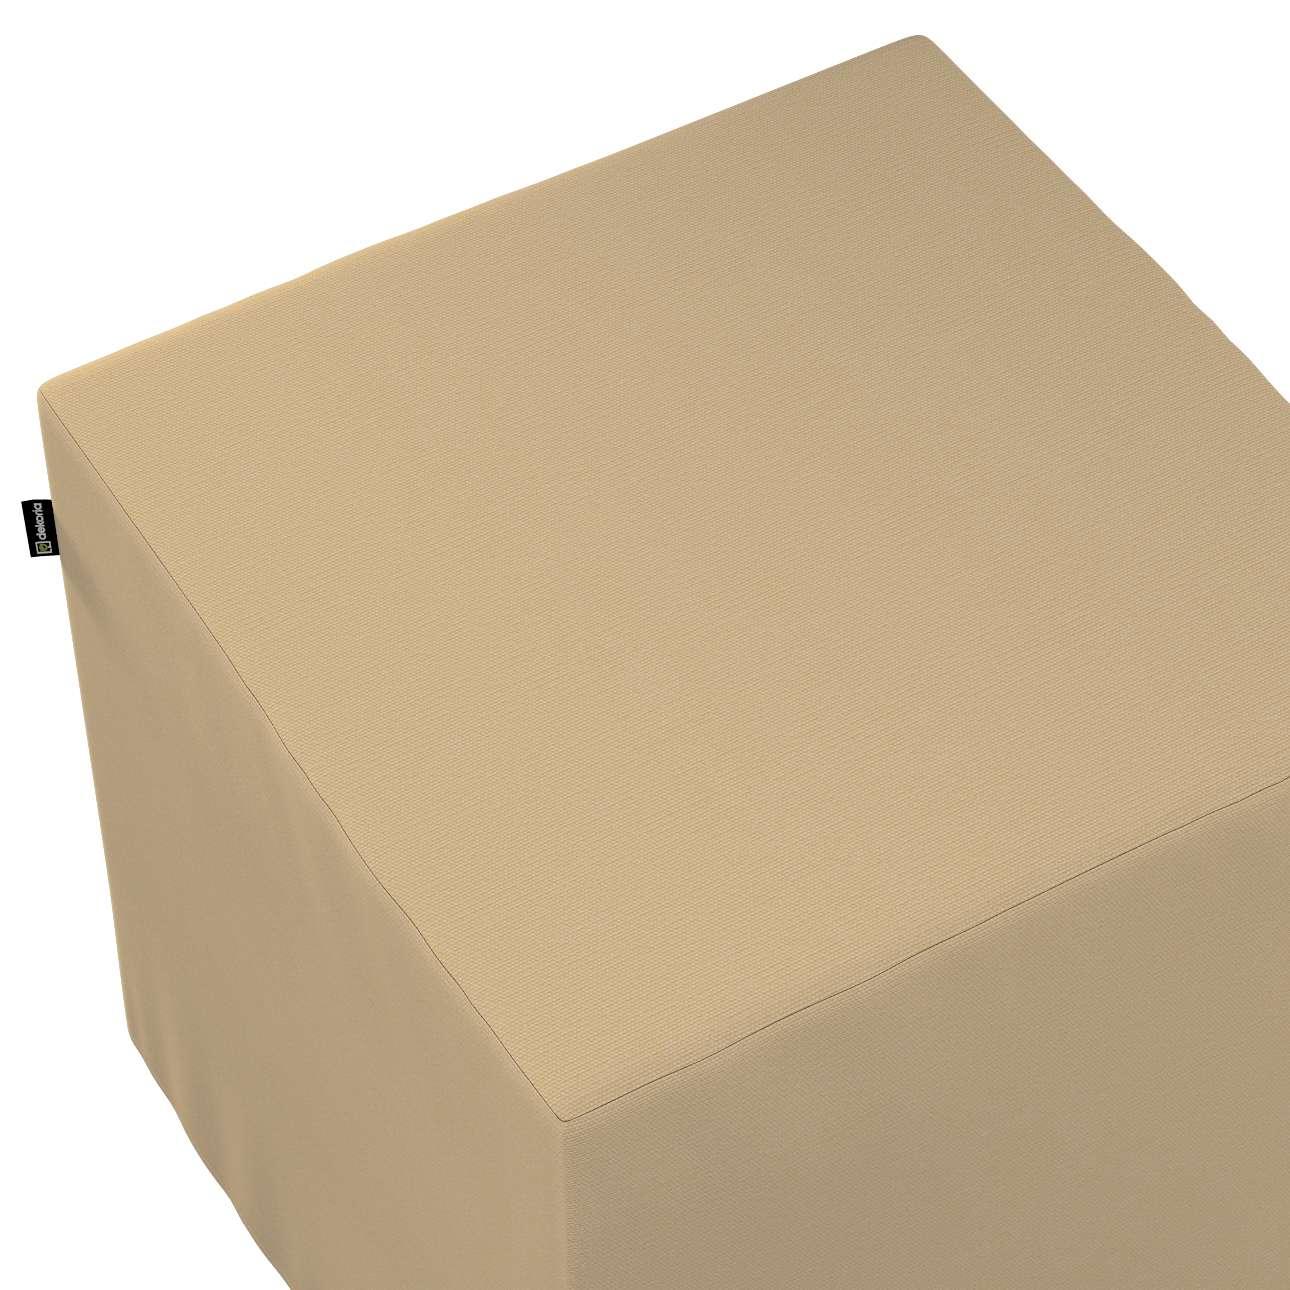 Pufa kostka w kolekcji Cotton Panama, tkanina: 702-01